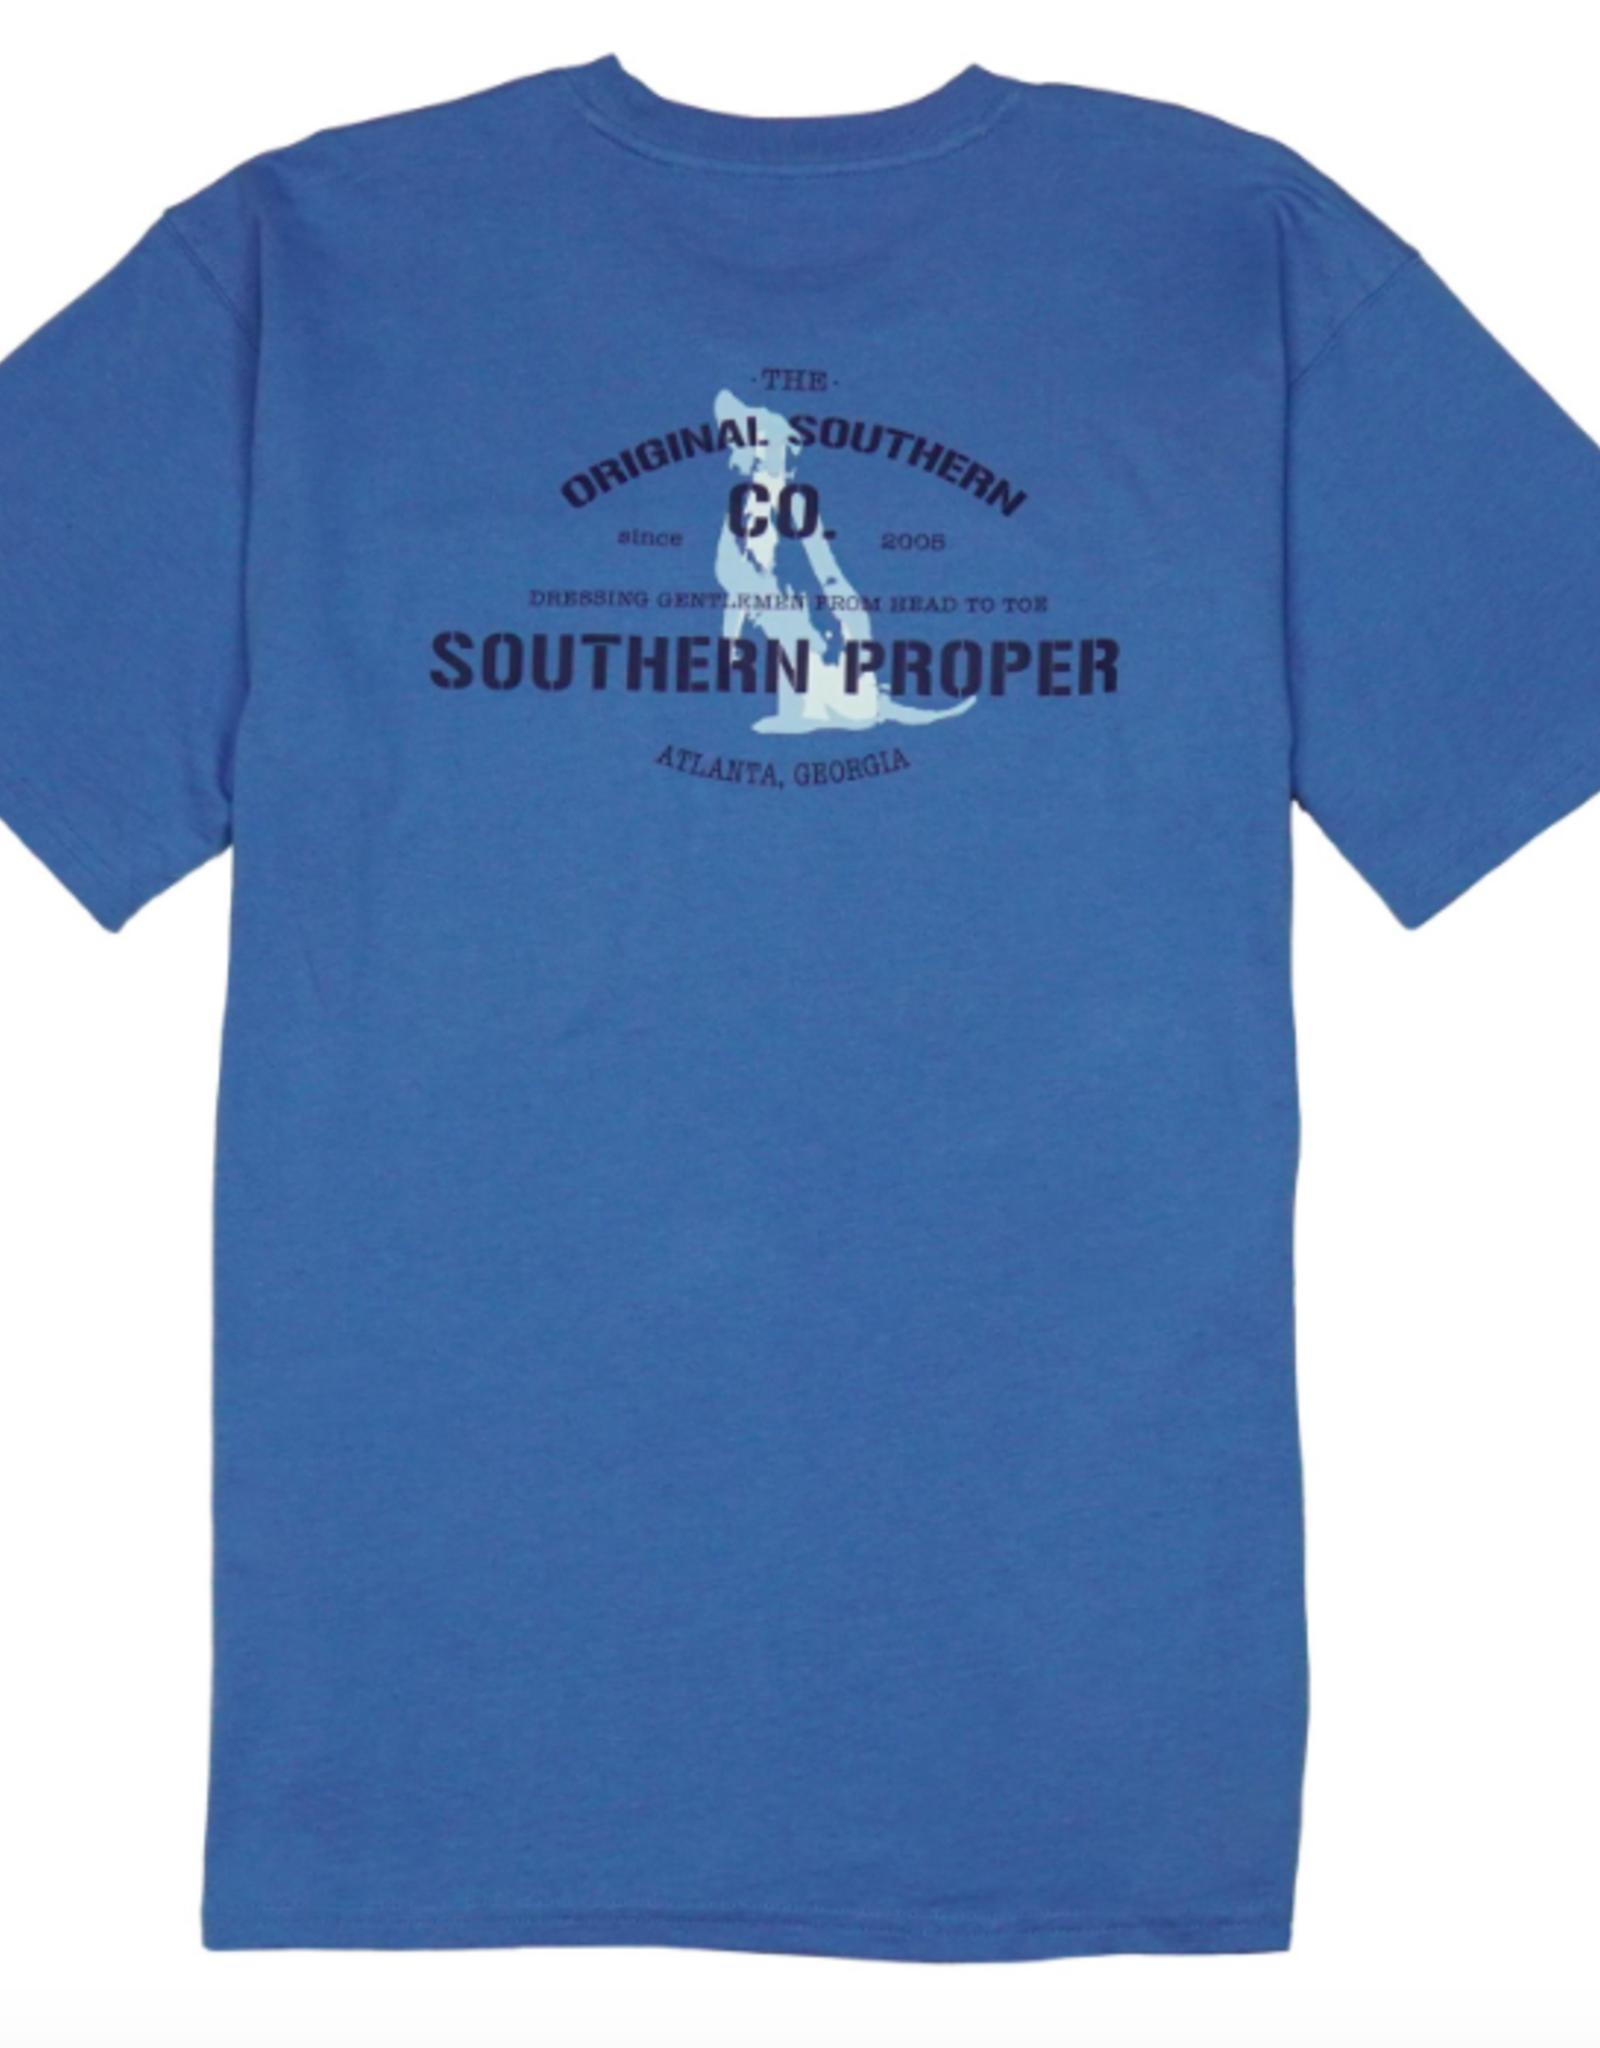 Southern Proper Original Southern Co Tee